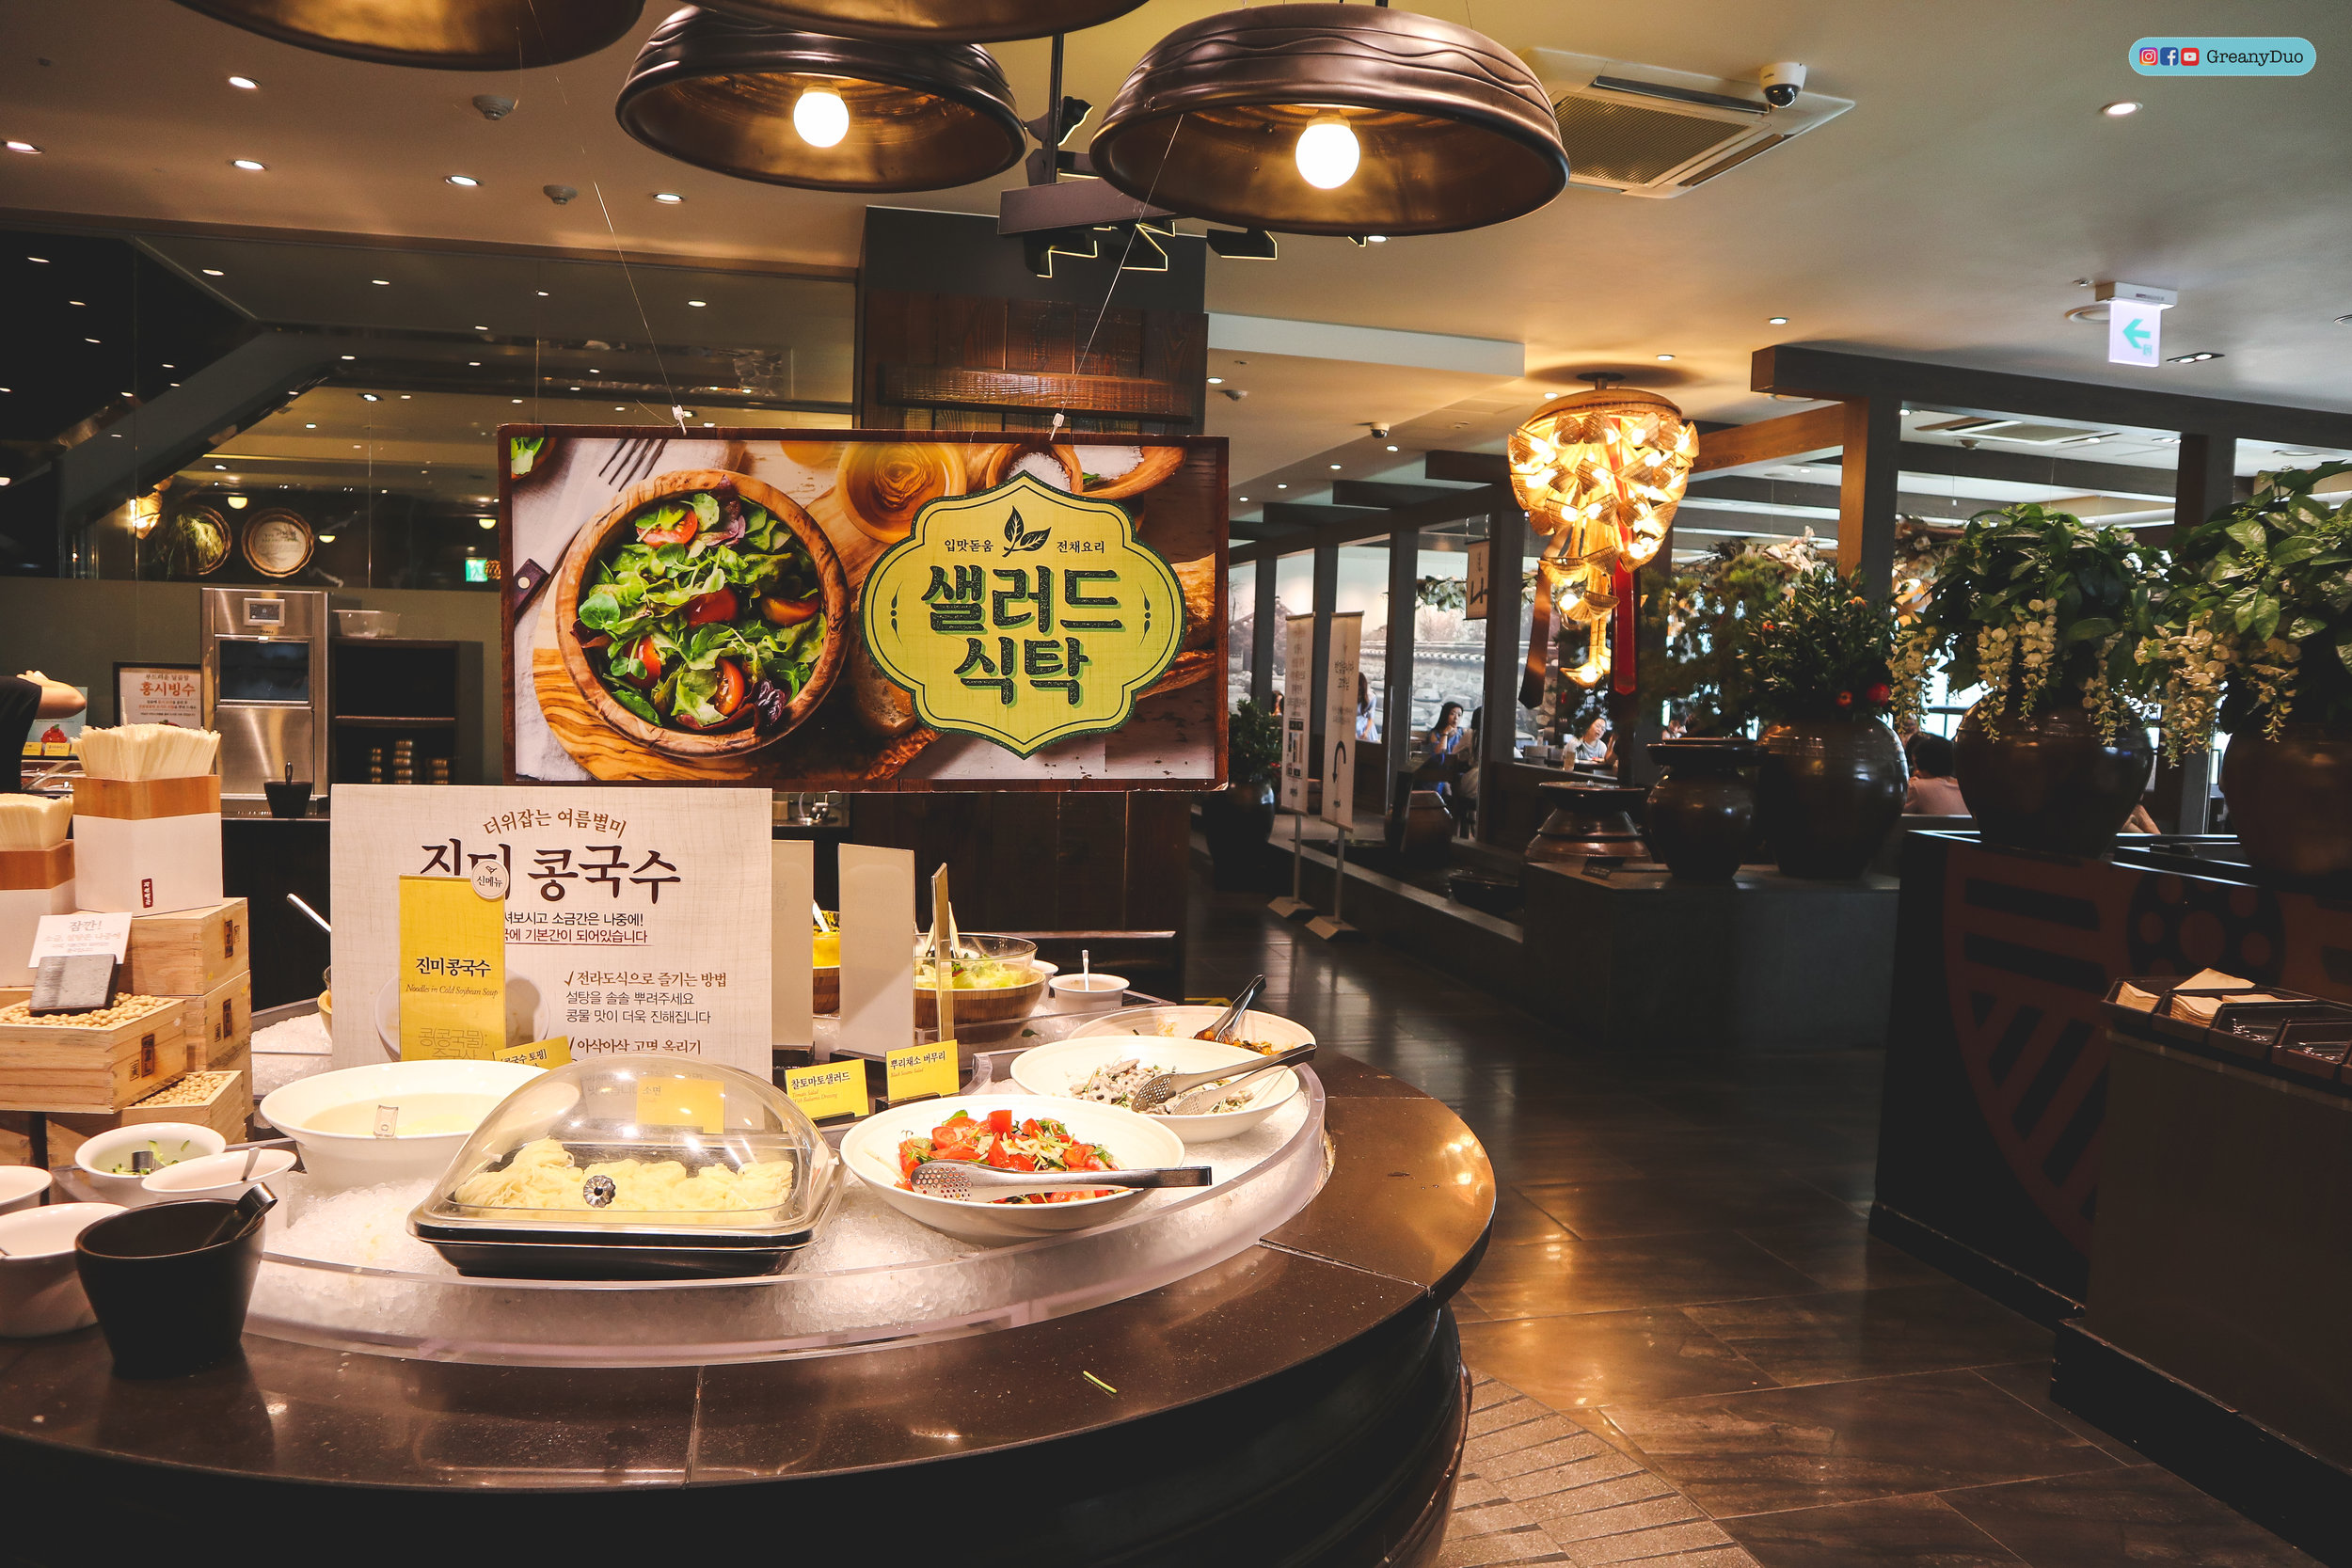 cold dishes,nature kitchen buffet, seoul korea